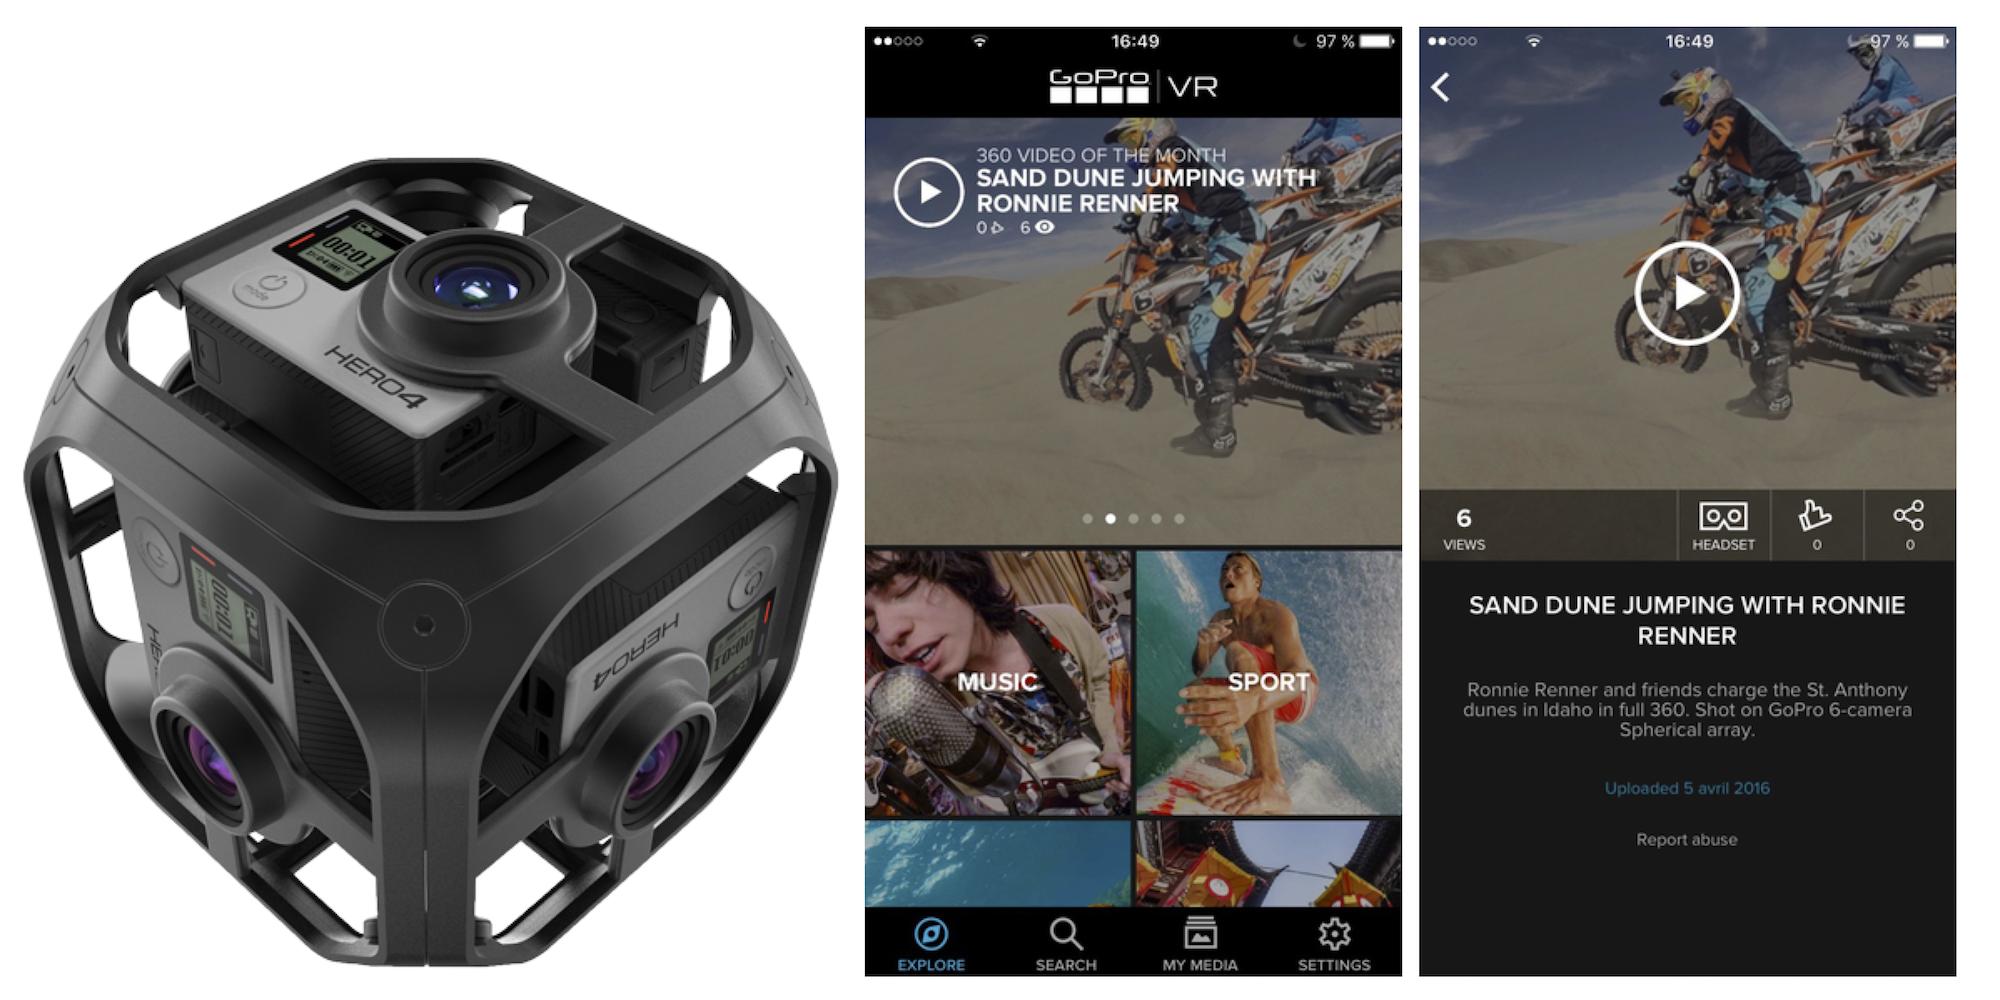 GoPro-VR-iPhone-app